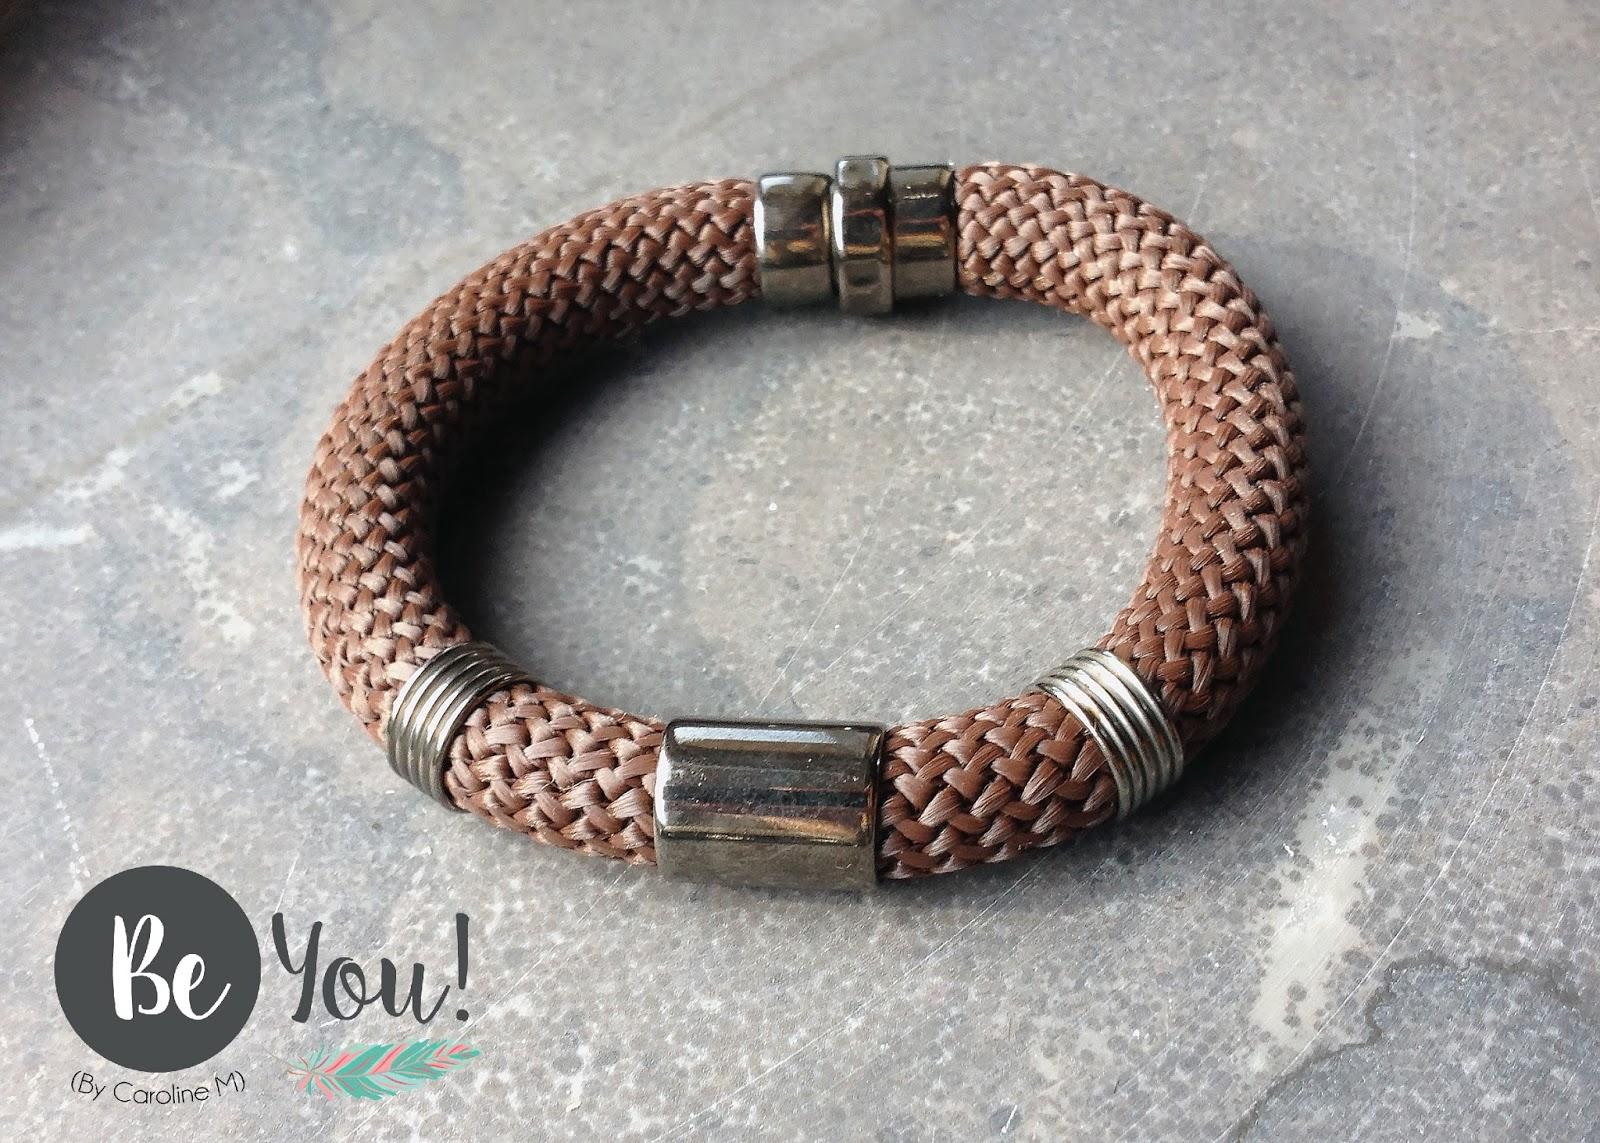 be you bracelet corde escalade pour homme. Black Bedroom Furniture Sets. Home Design Ideas